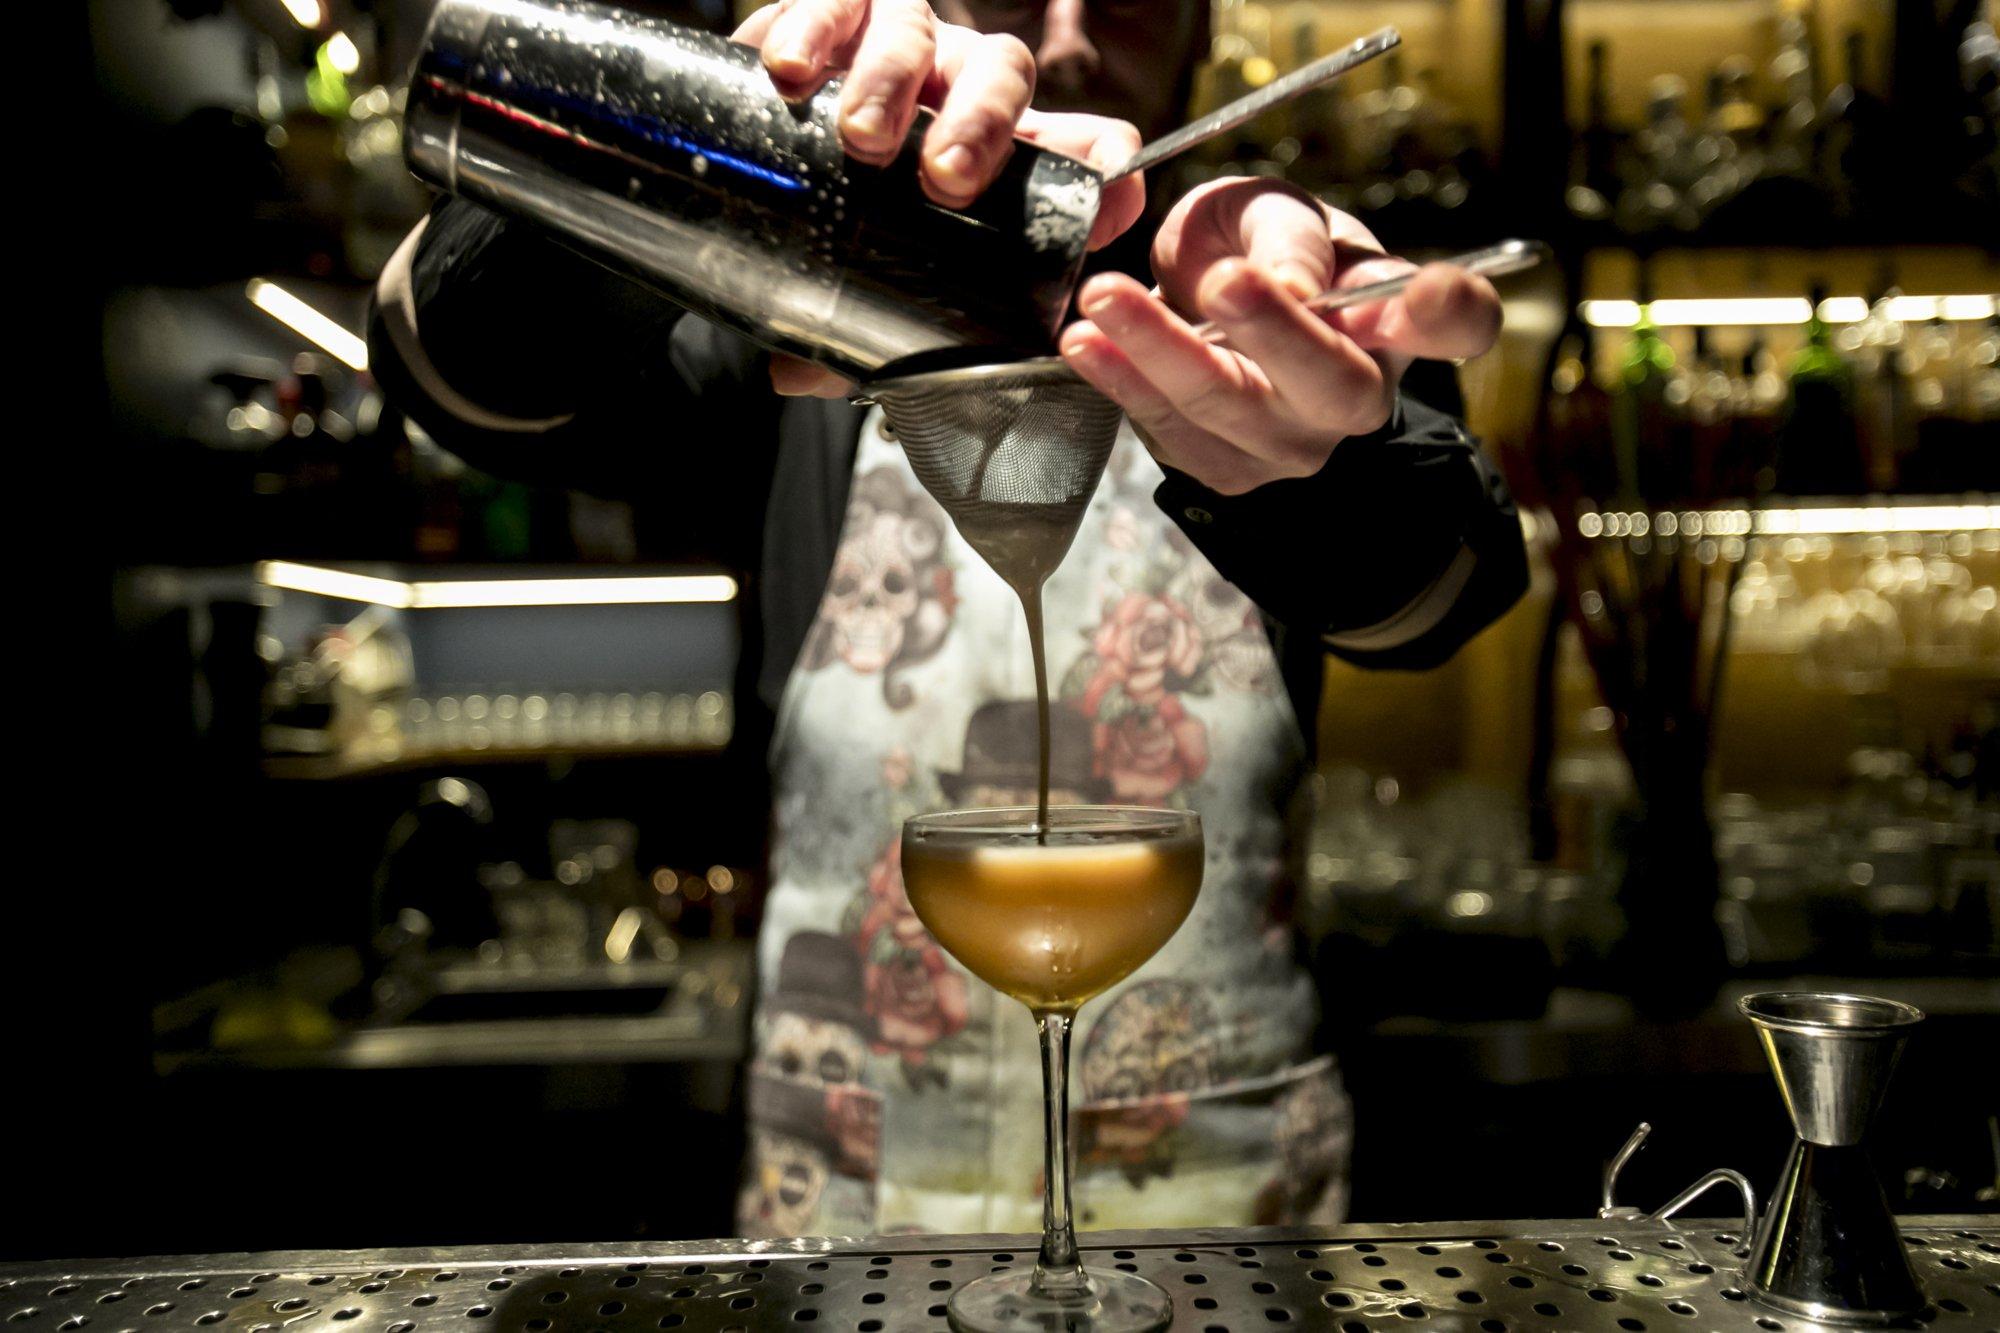 World Class Fine Drinking, η μεγαλύτερη γιορτή του καλού ποτού επιστρέφει και φέτος στη Θεσσαλονίκη!